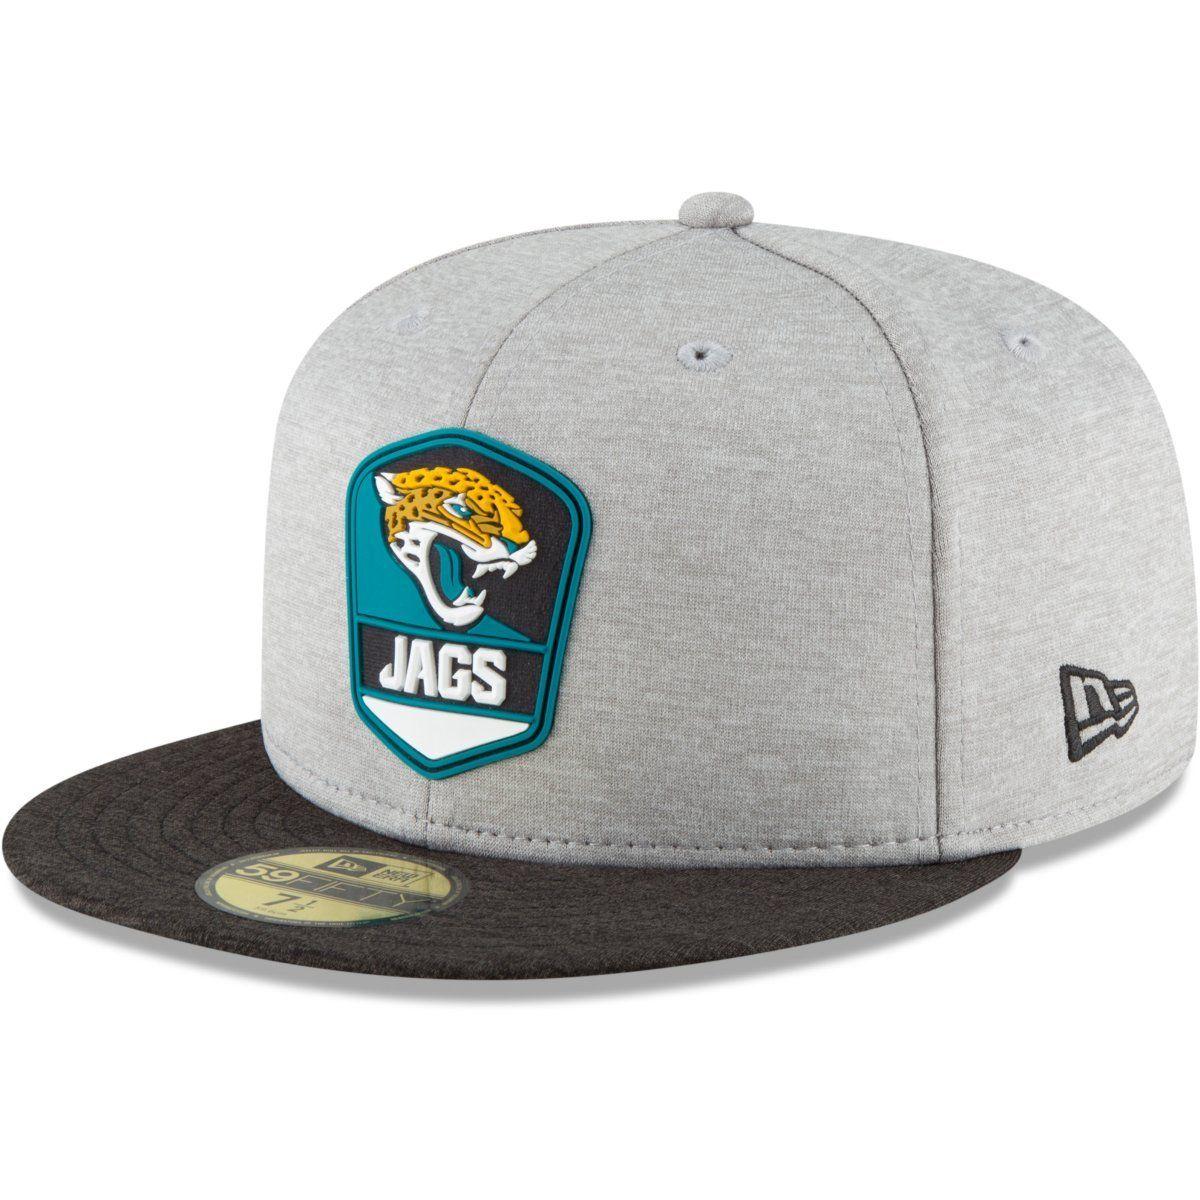 amfoo - New Era 59Fifty Cap - NFL Sideline Away Jacksonville Jaguars